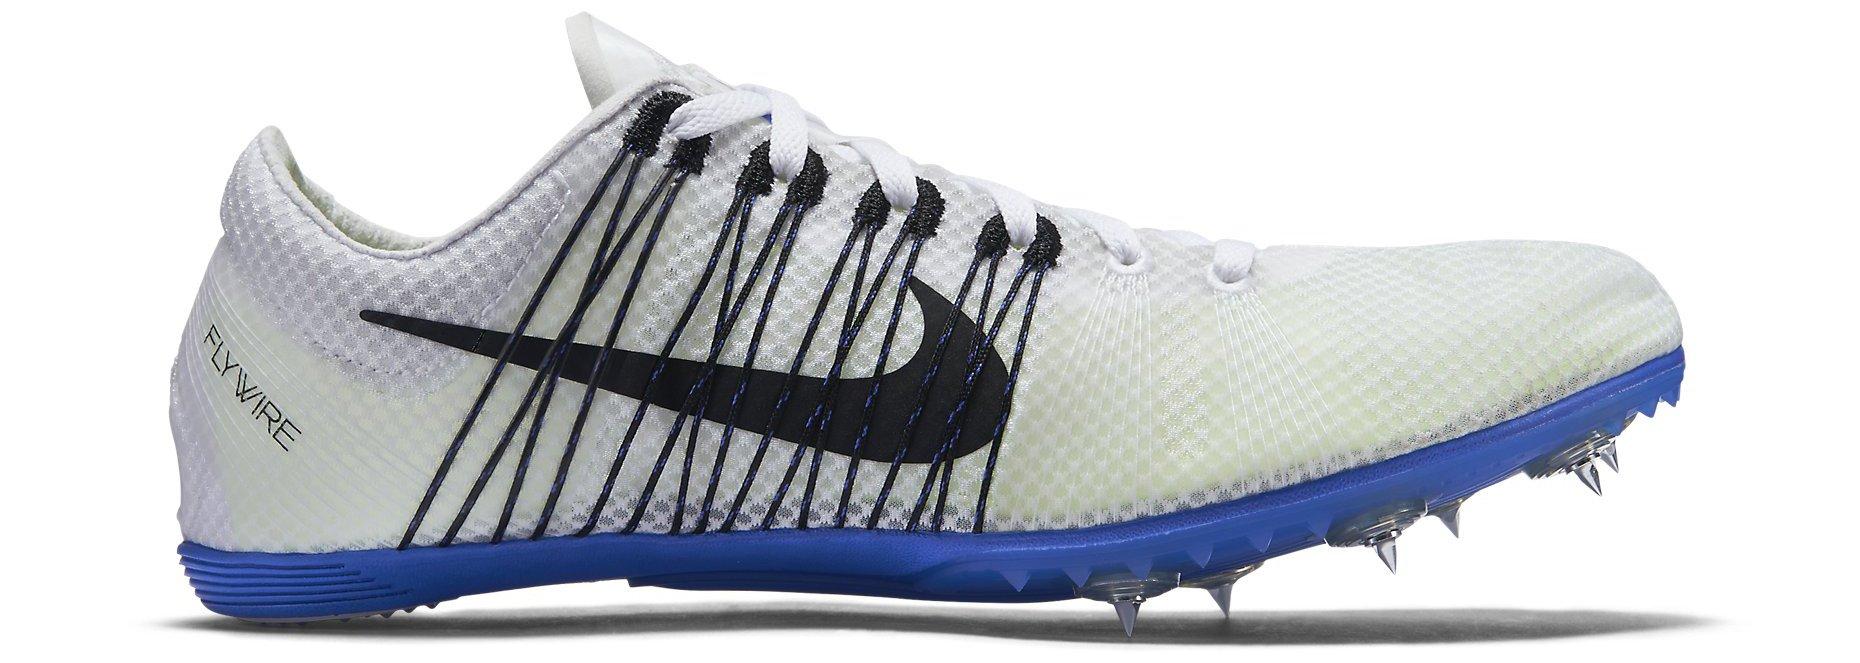 Tretry Nike ZOOM VICTORY 2